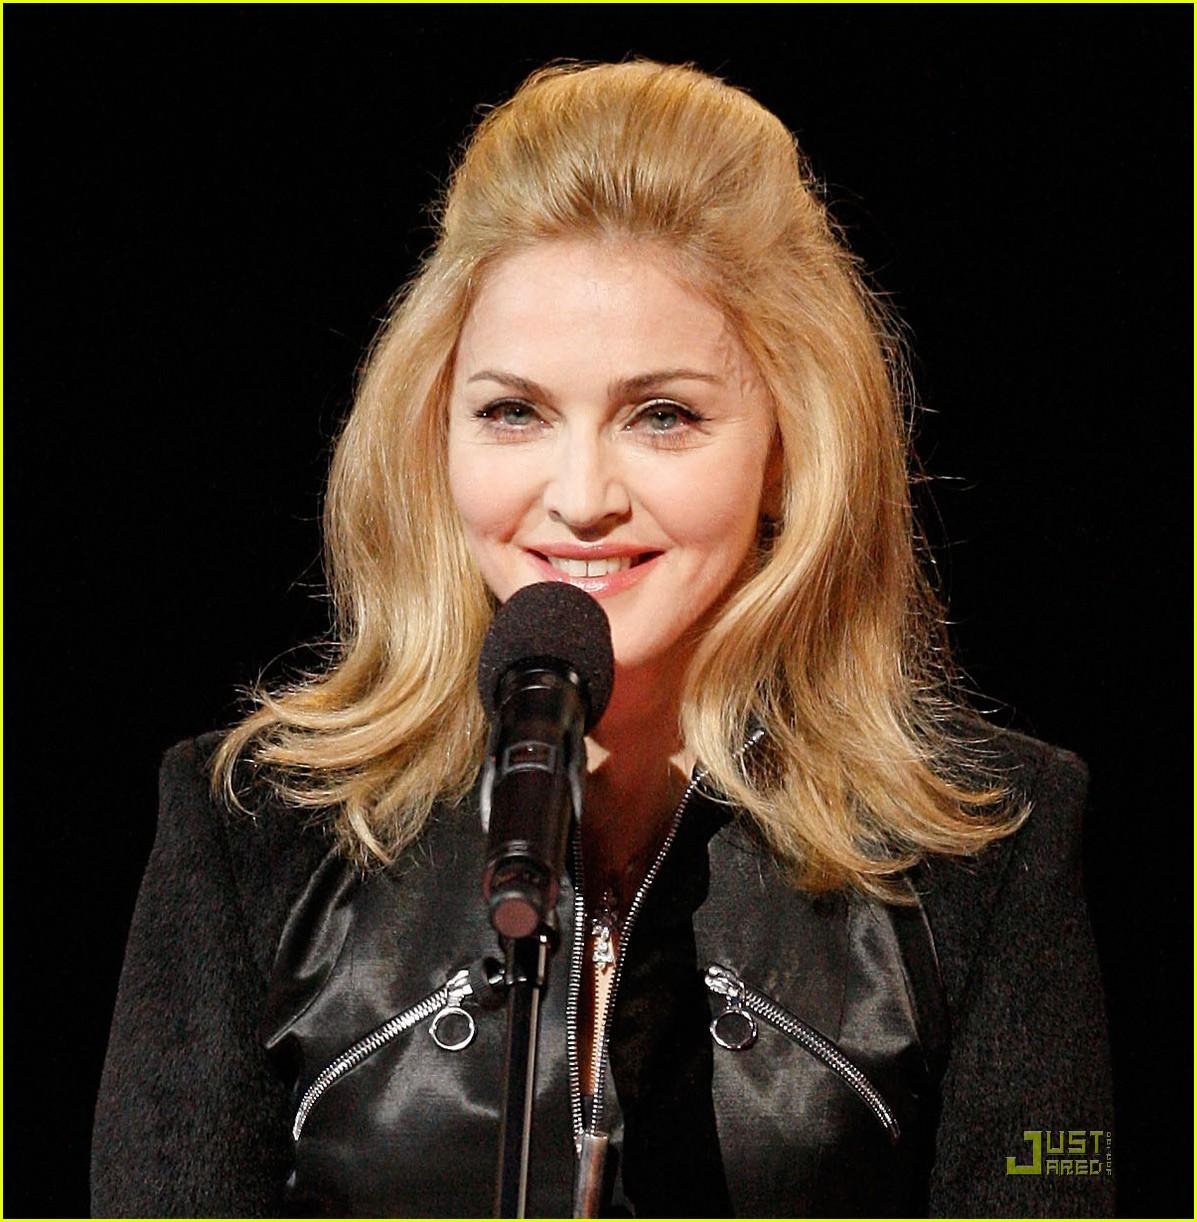 http://4.bp.blogspot.com/-EMnTQVwlmNc/UEOI9clbniI/AAAAAAAAYw8/nD3e7IMuH6Q/s1600/Madonna+II.jpg